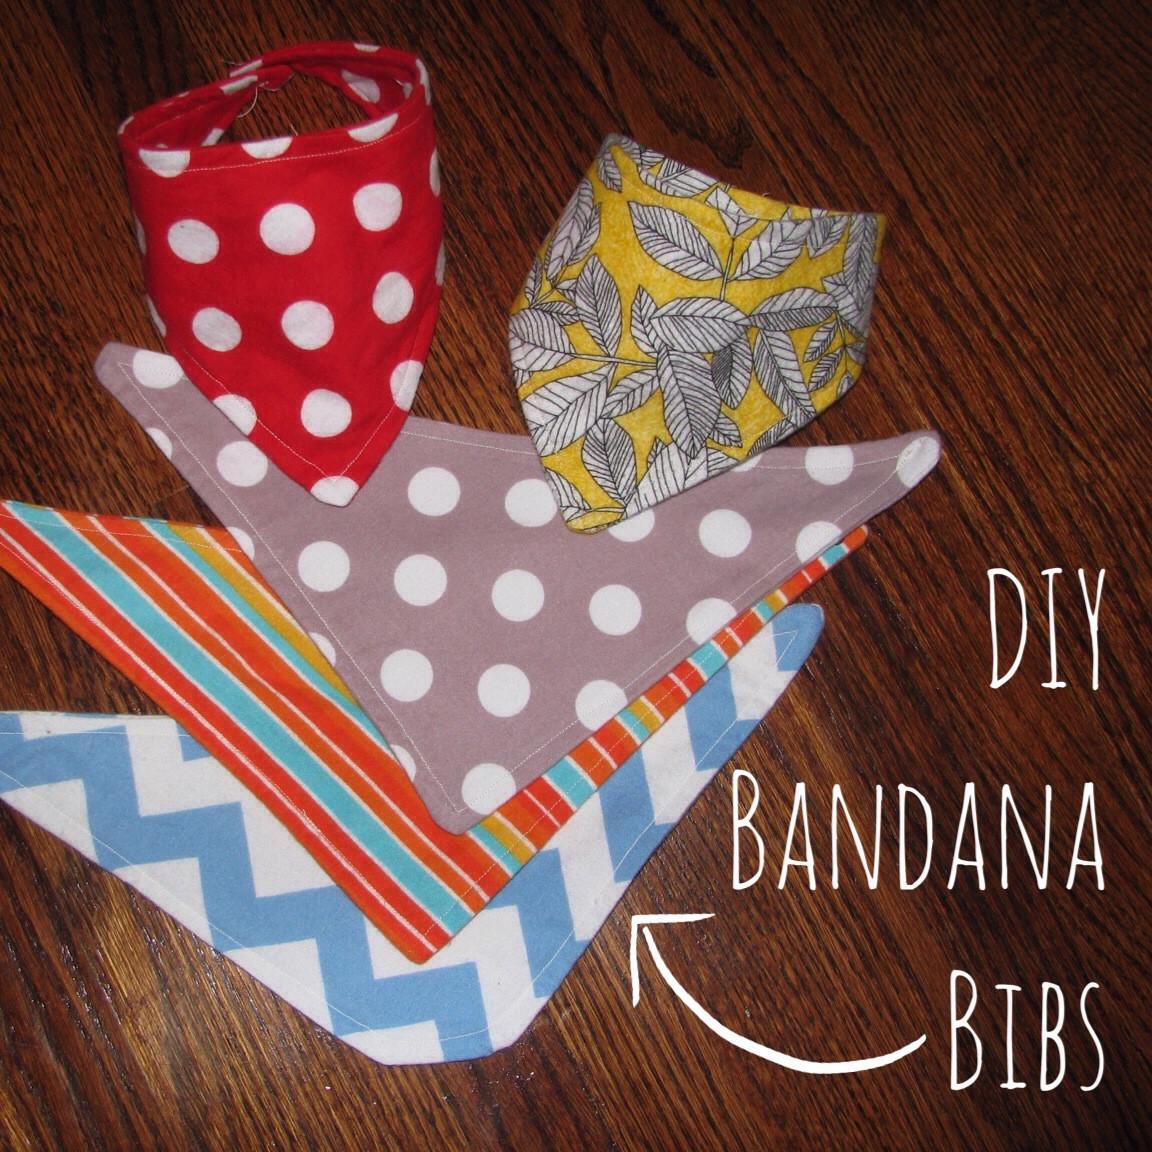 Best ideas about DIY Baby Bibs . Save or Pin DIY Bandana Bibs Now.